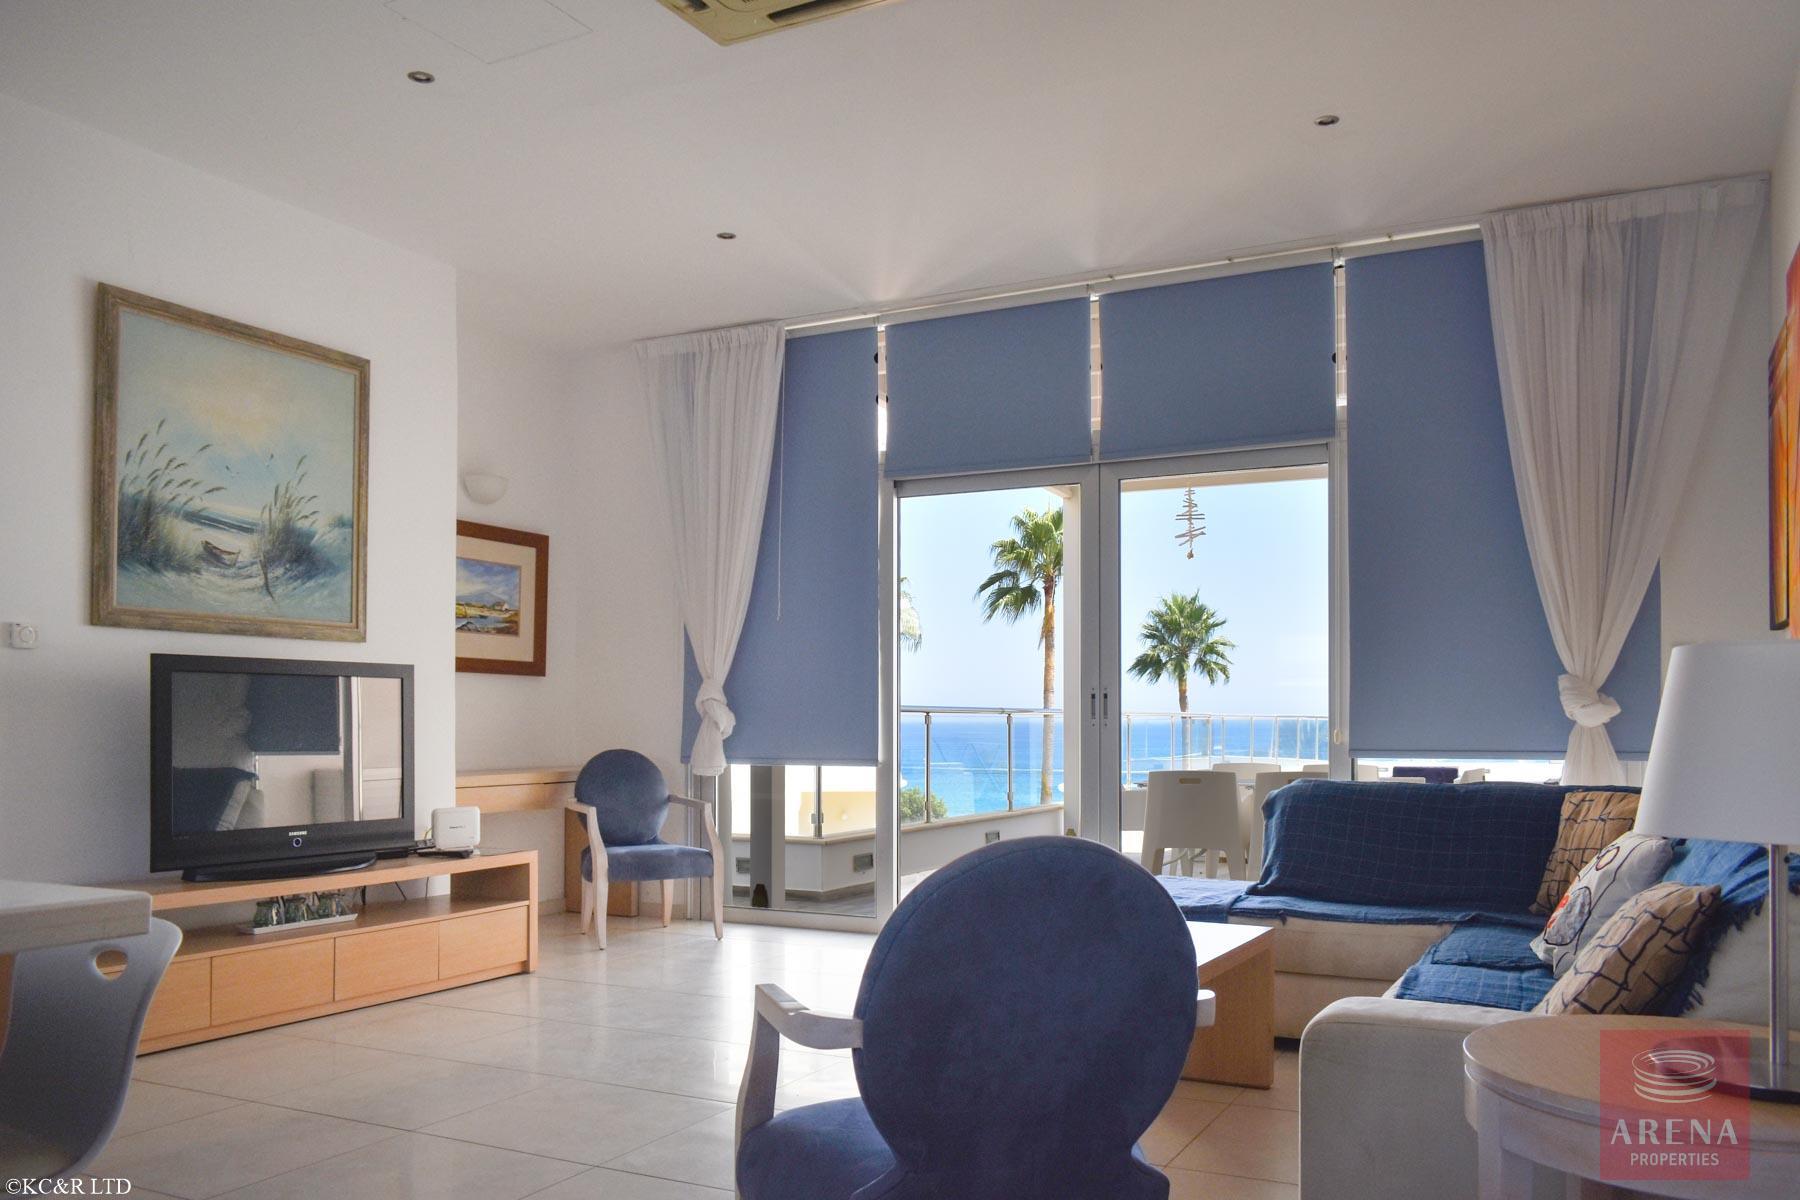 Seafront Apartment in Protaras - living area